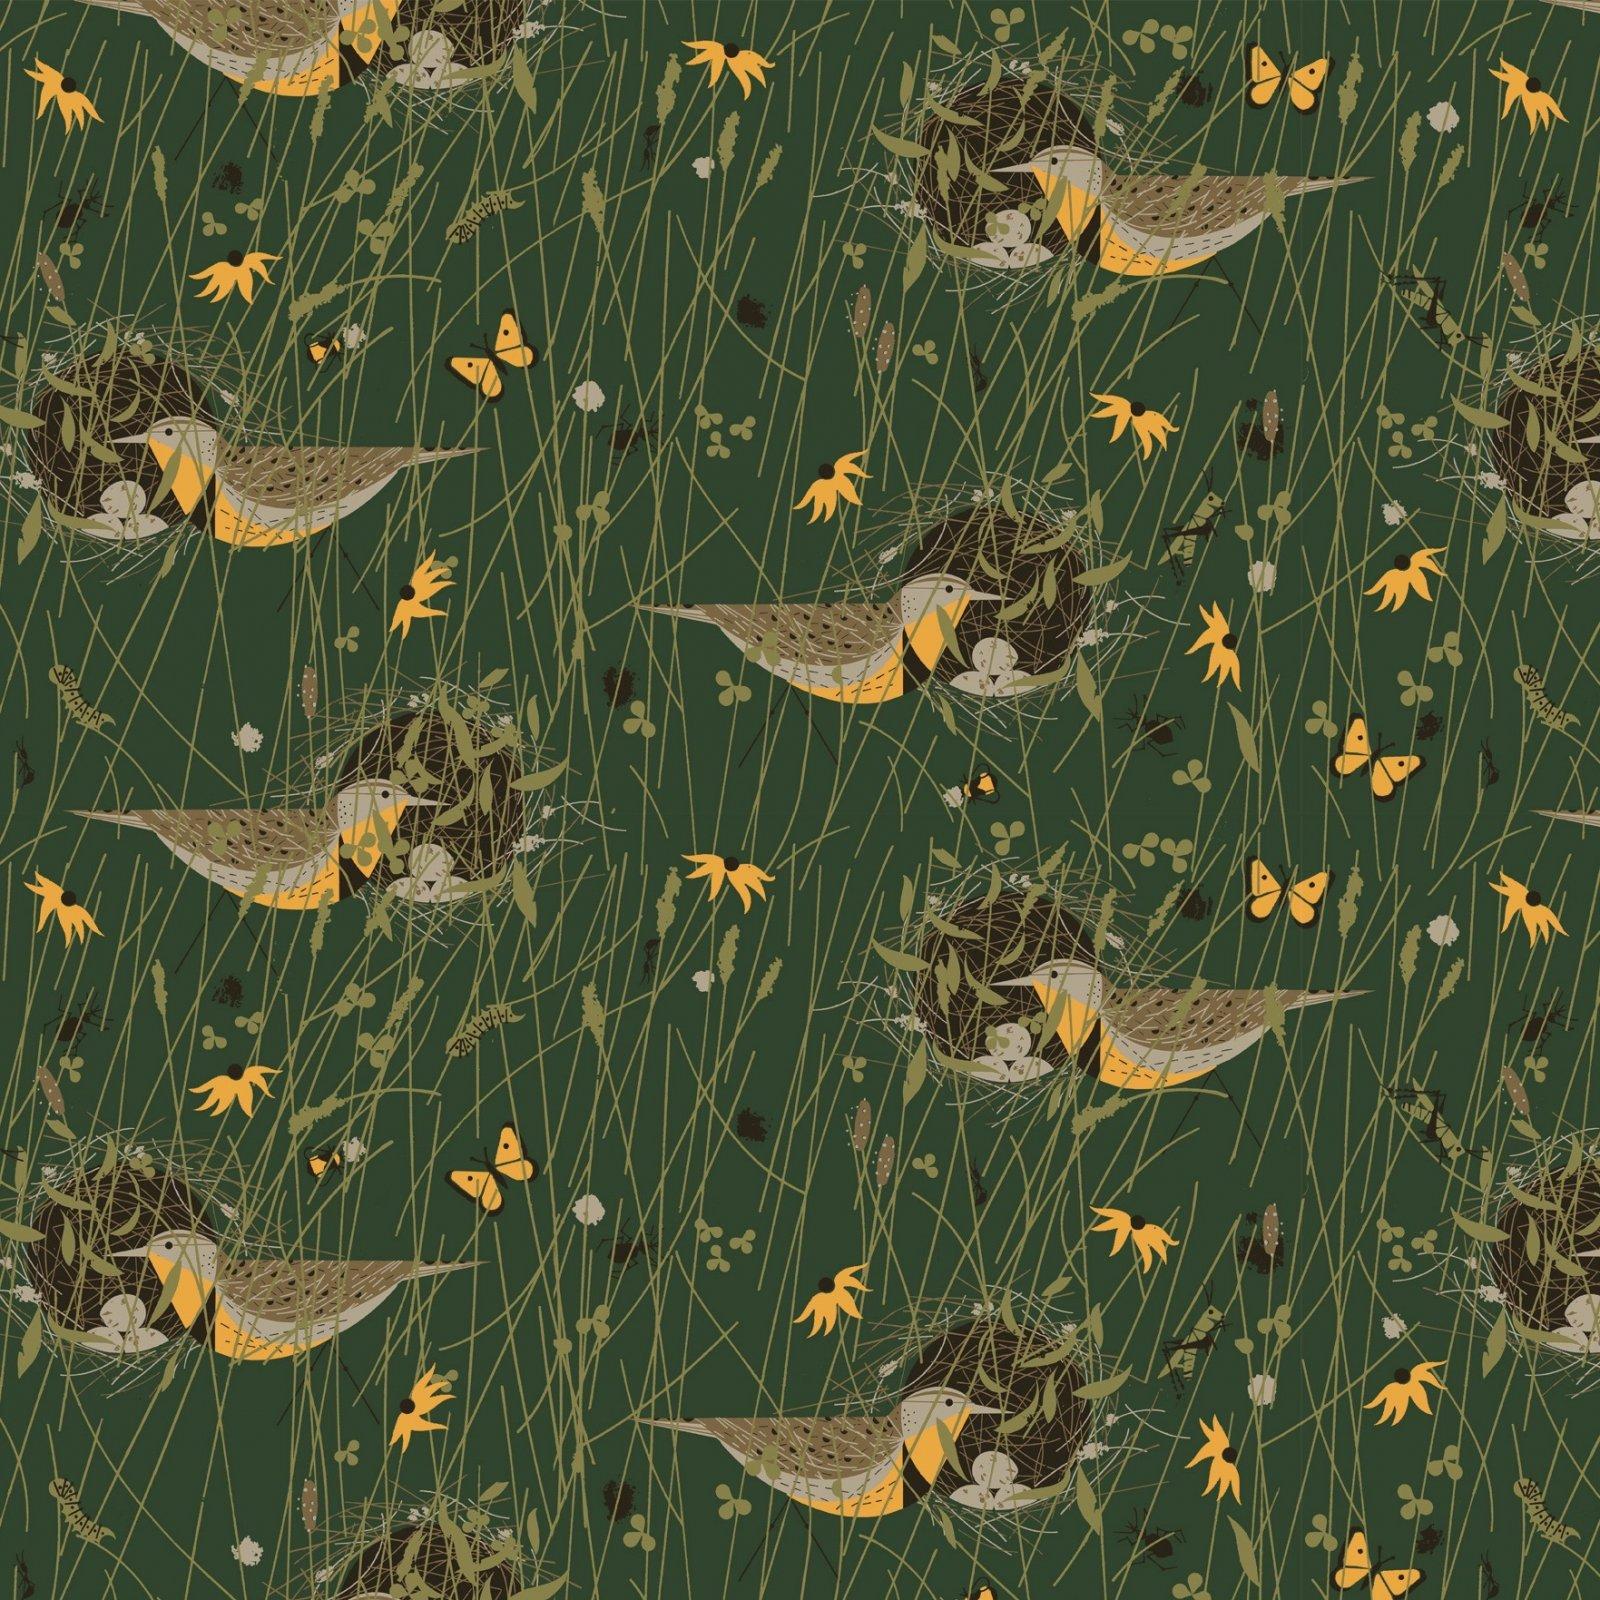 Charley Harper Canvas 2020 - Eastern Meadowlark (Green)